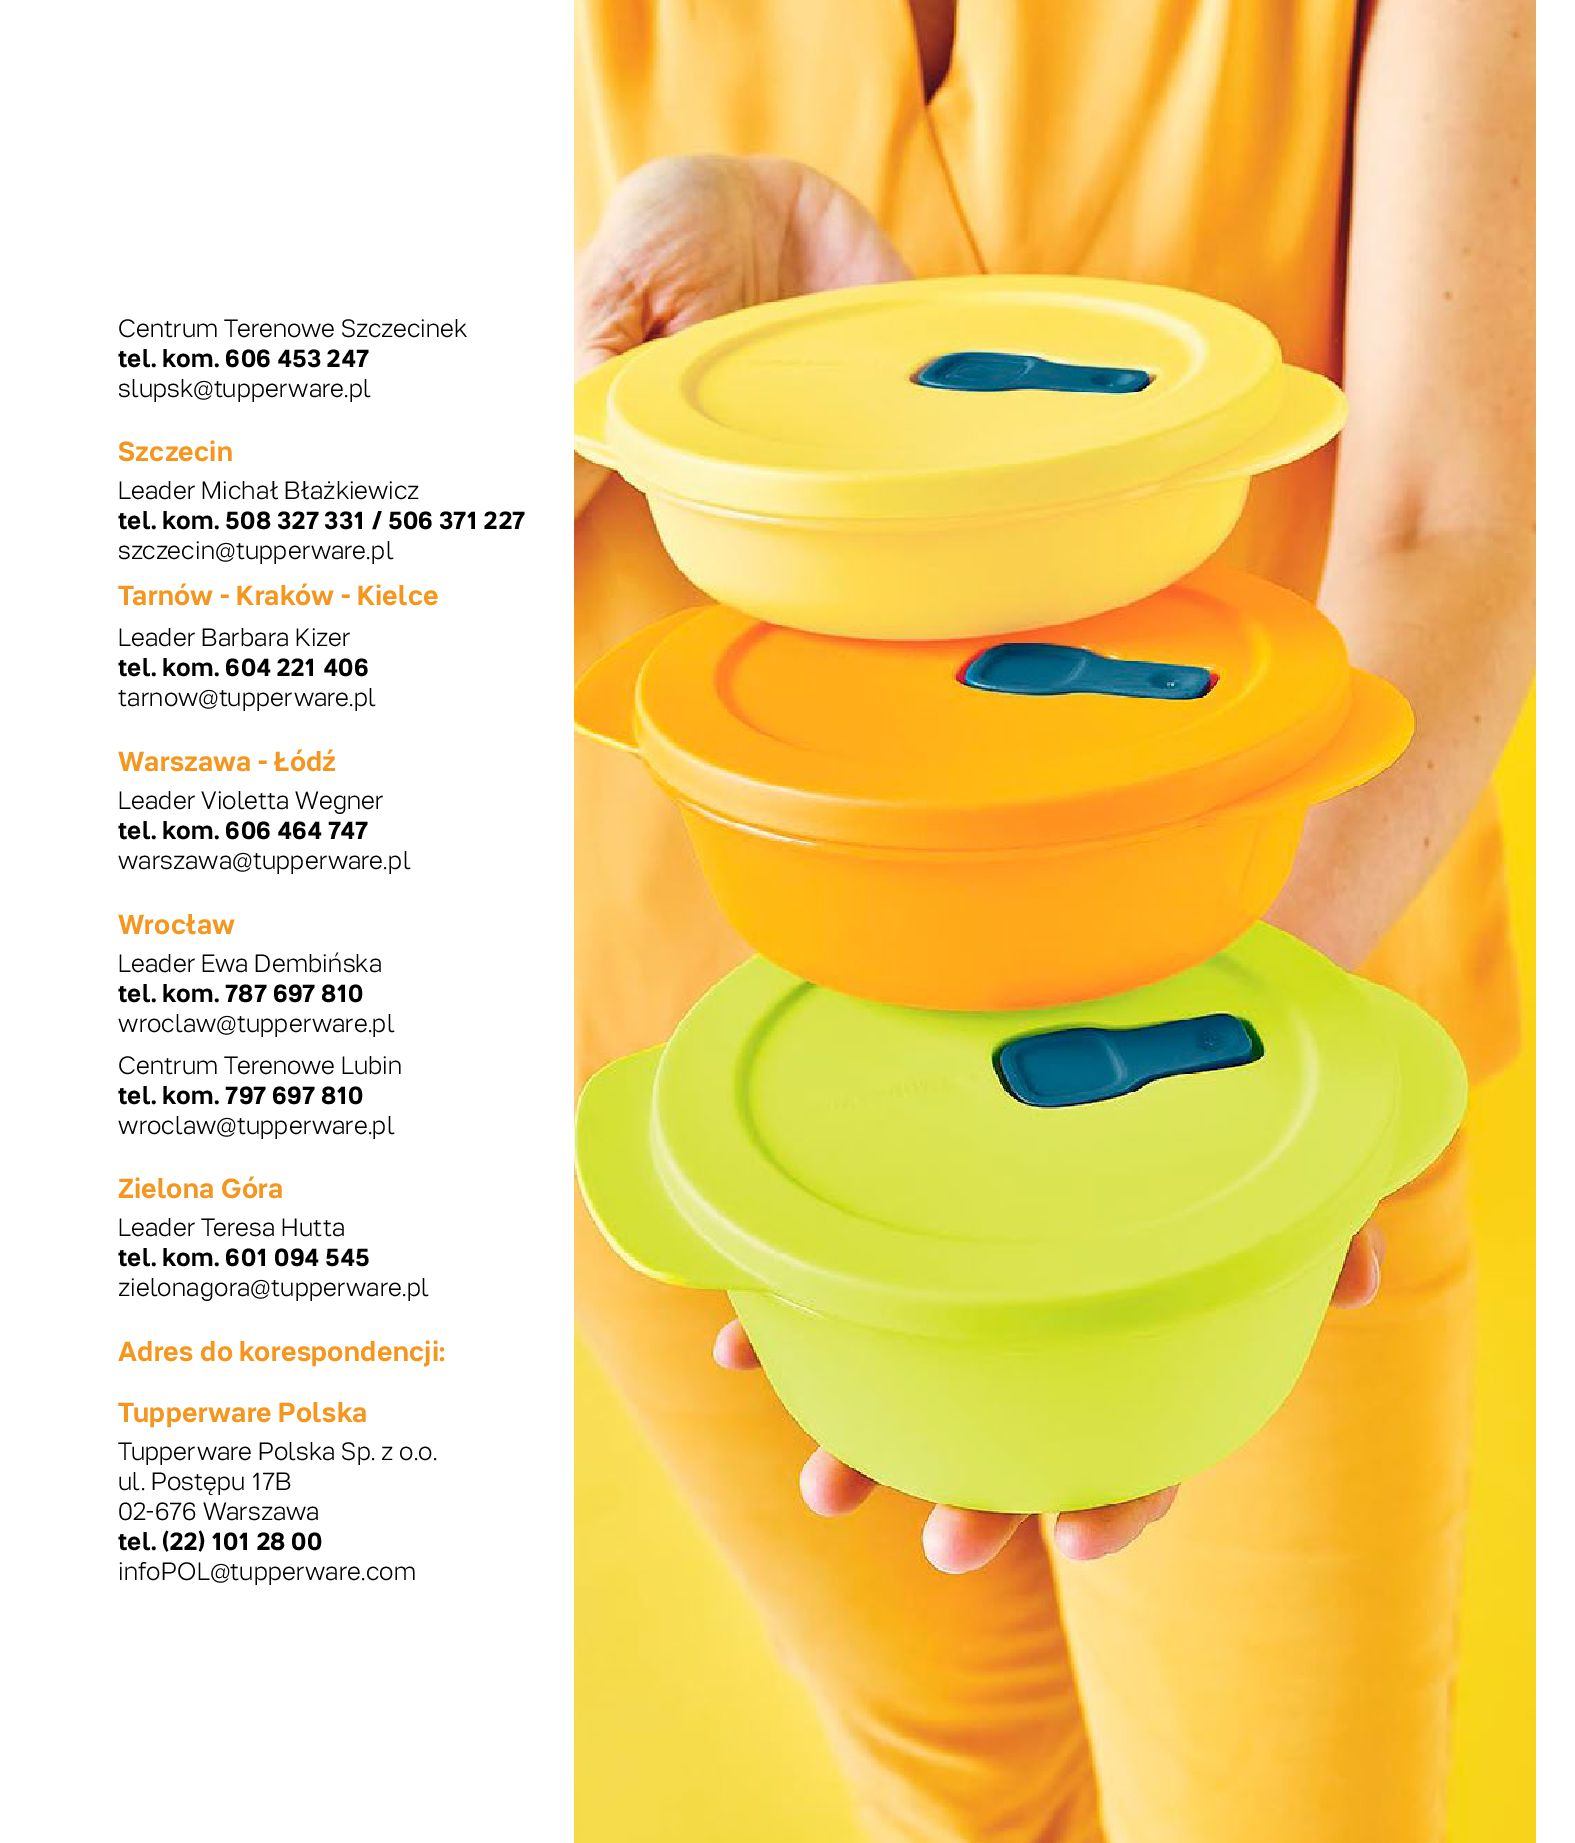 Gazetka Tupperware: Gazetka Tupperware - Katalog wiosna/ lato 2021-05-10 page-61